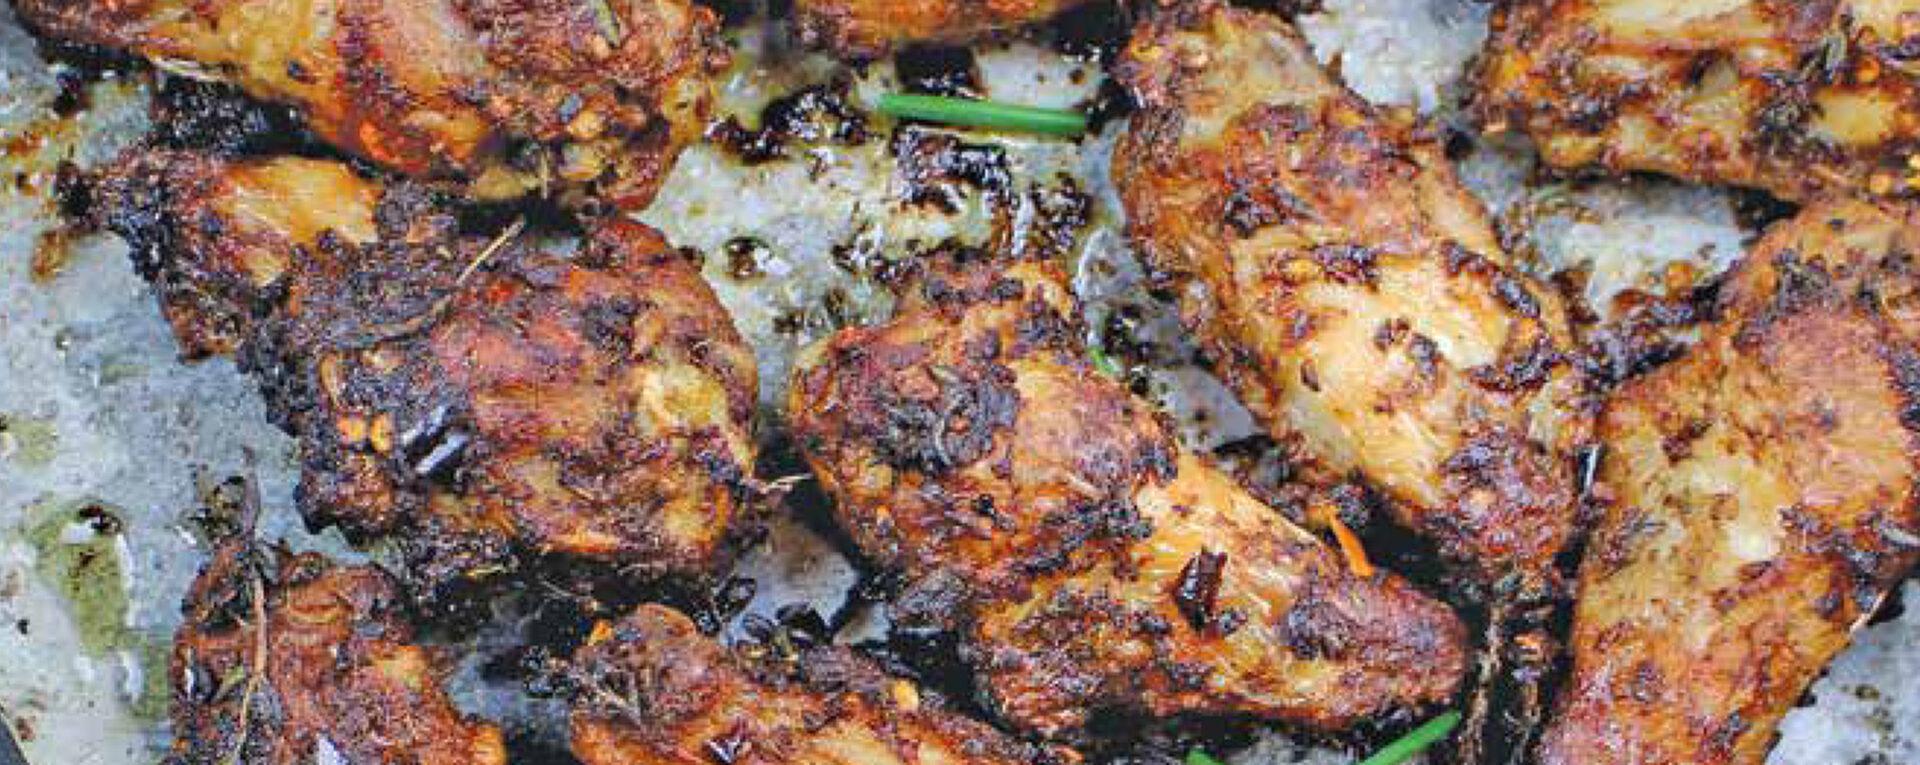 Baked Jamaican Jerk Chicken Wings